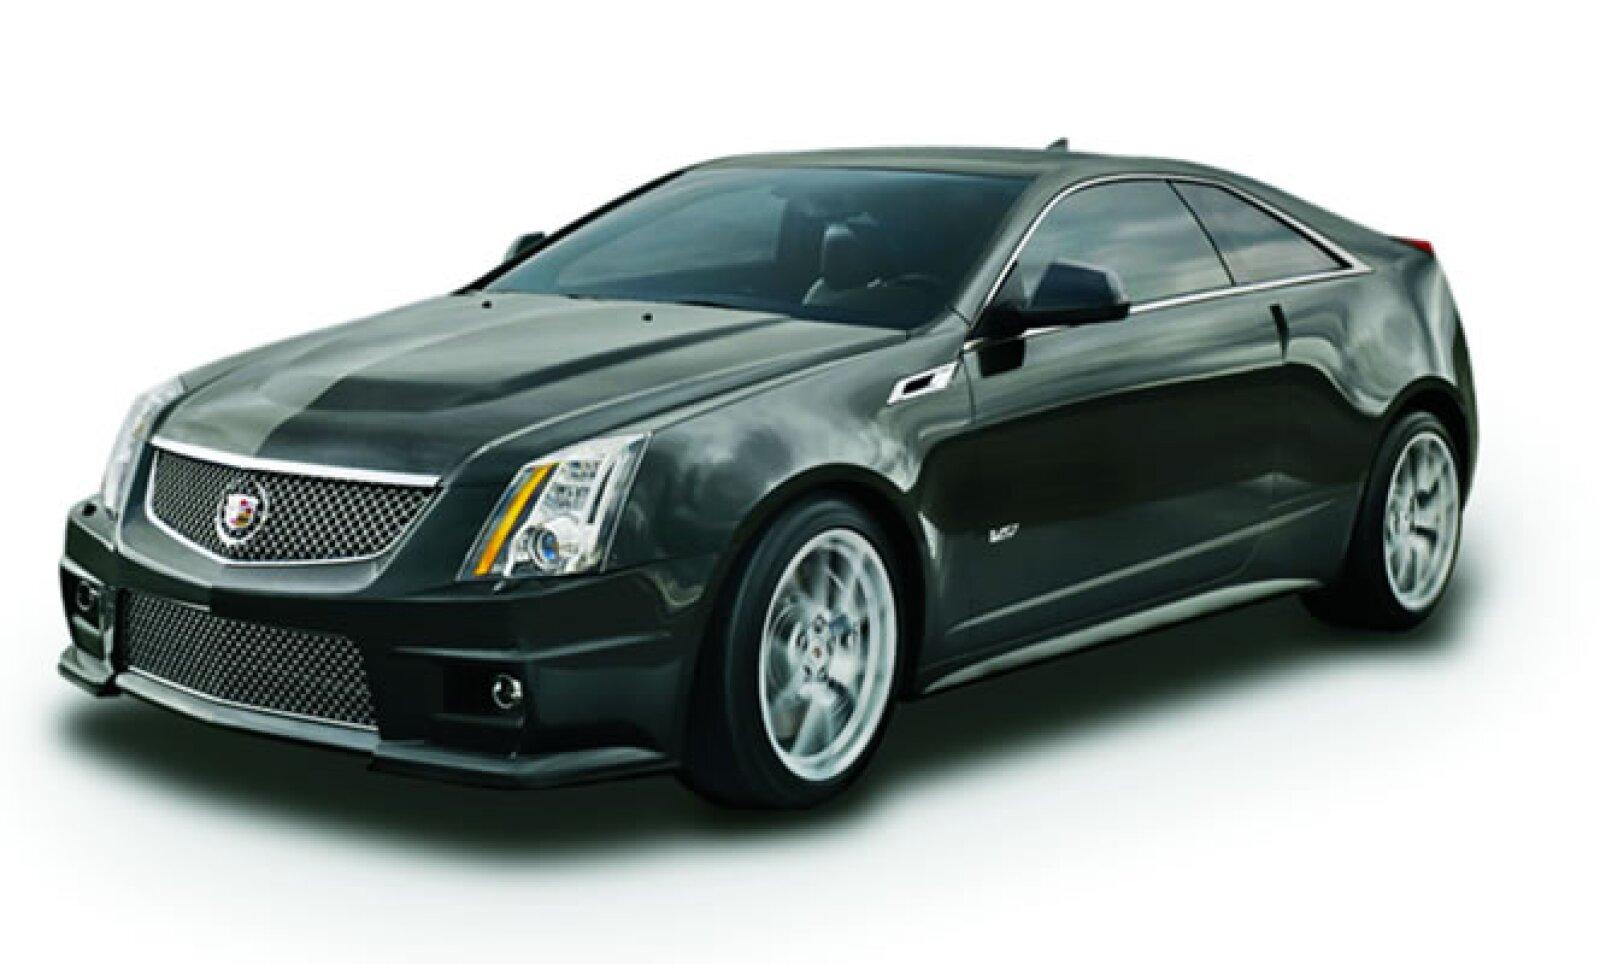 Motor: 6.2 l V8 supercargado, 556 Hp, y 550 lb/pie de torque. Tracción trasera. Llegará a México a final de 2010 o inicio de 2011.